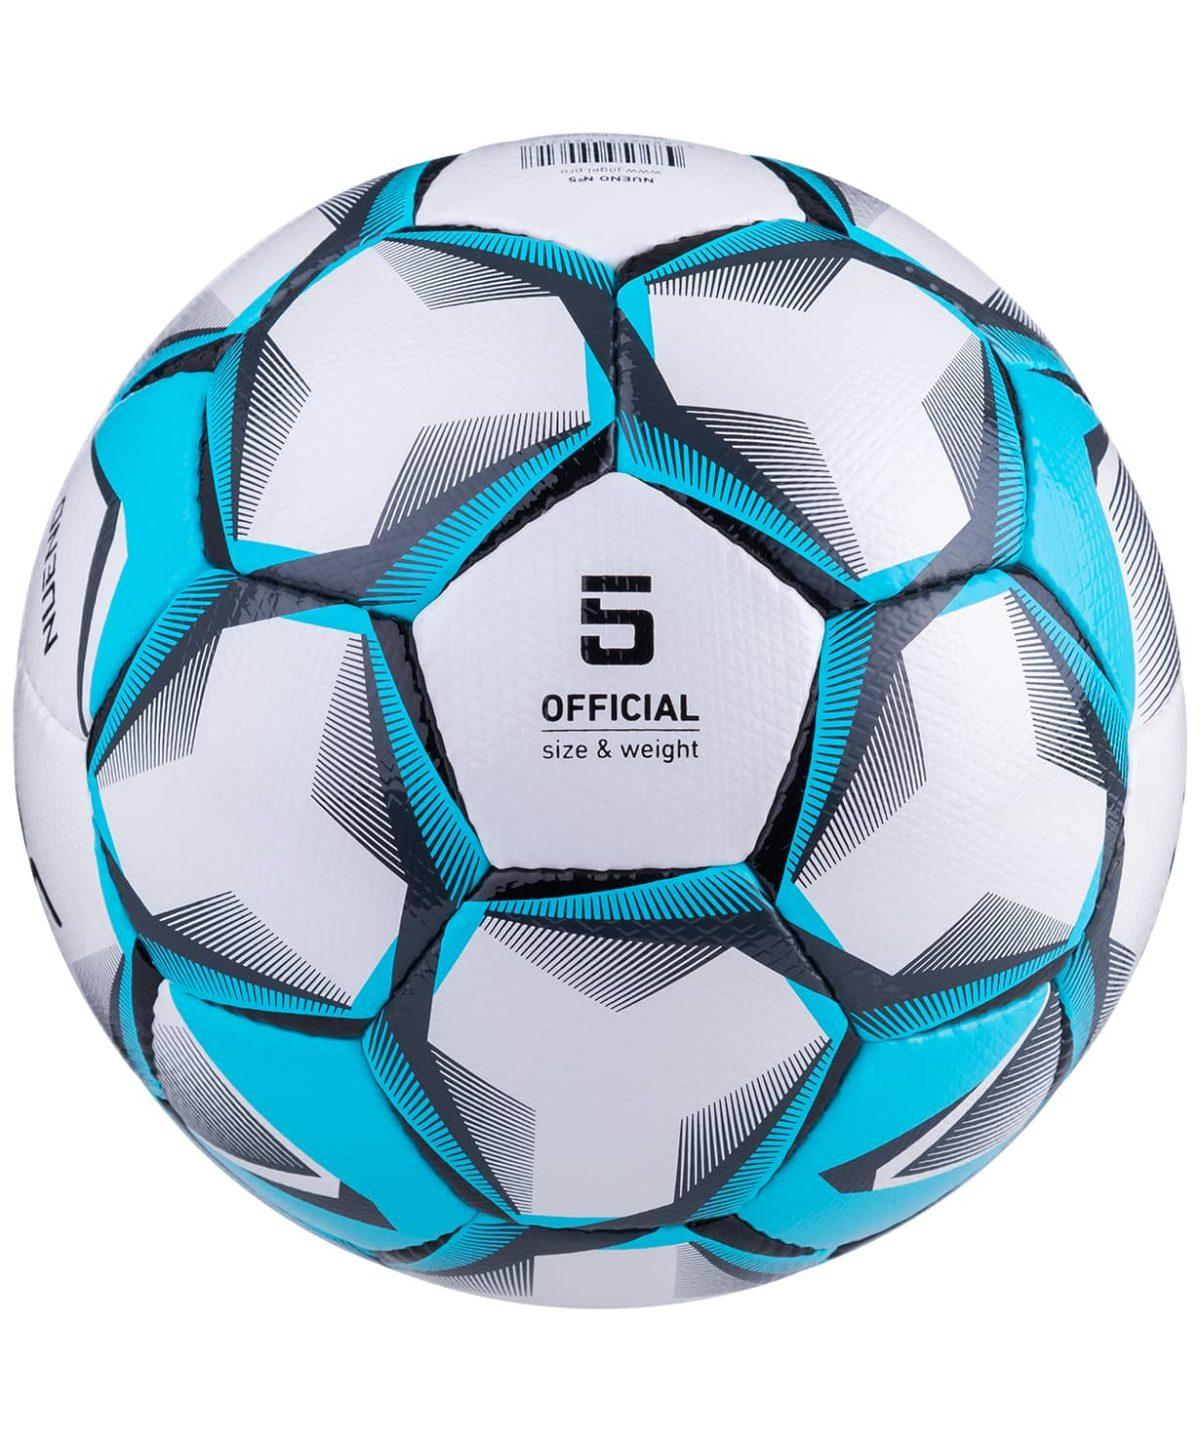 JOGEL Nueno Мяч футбольный  Nueno №5 (BC-20) - 2